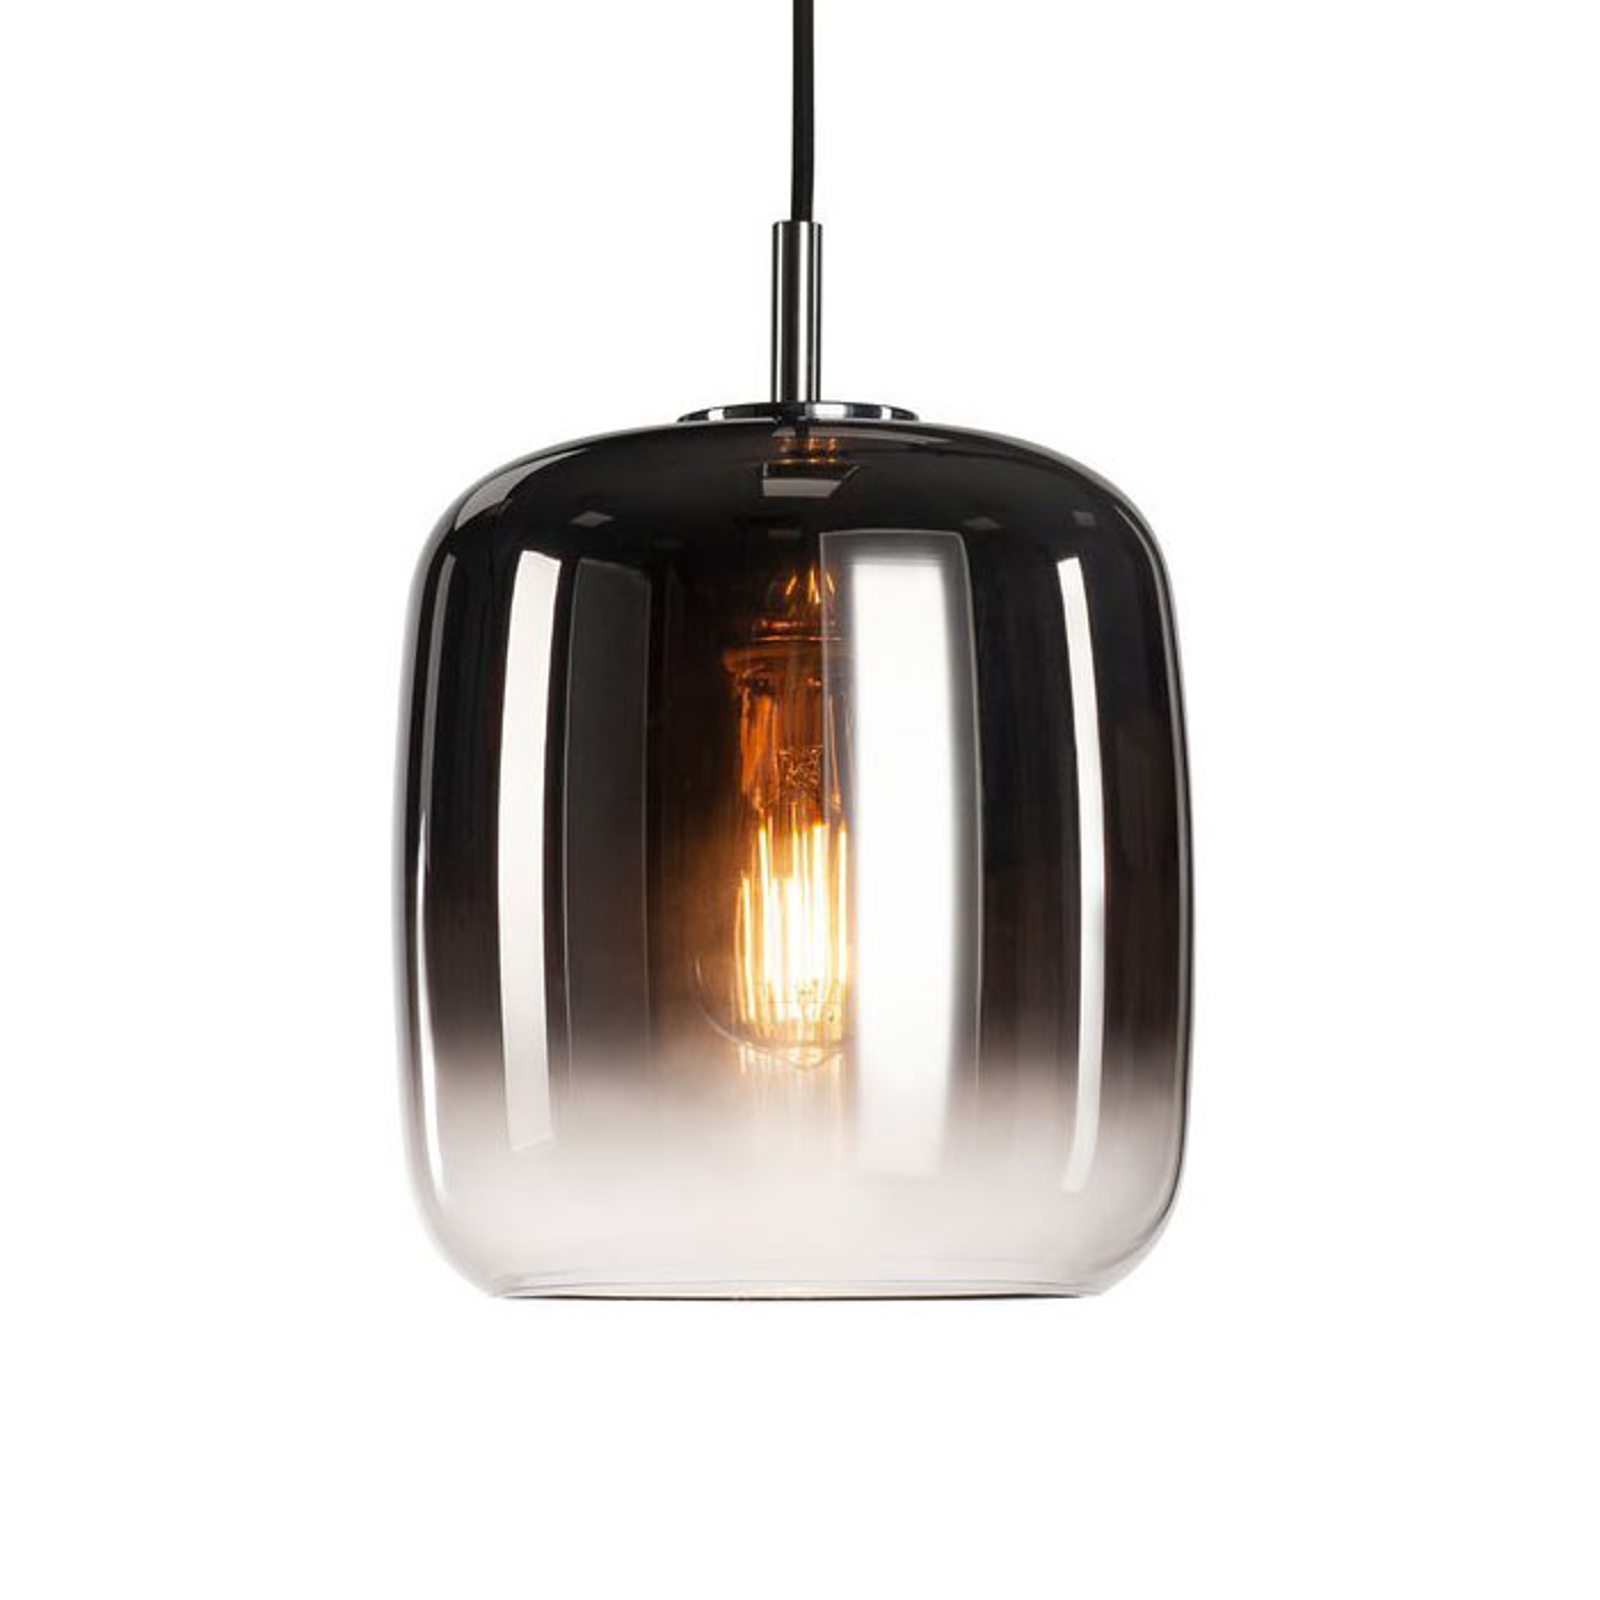 SLV Pantilo 20 lampa wisząca, Ø 20 cm, chrom